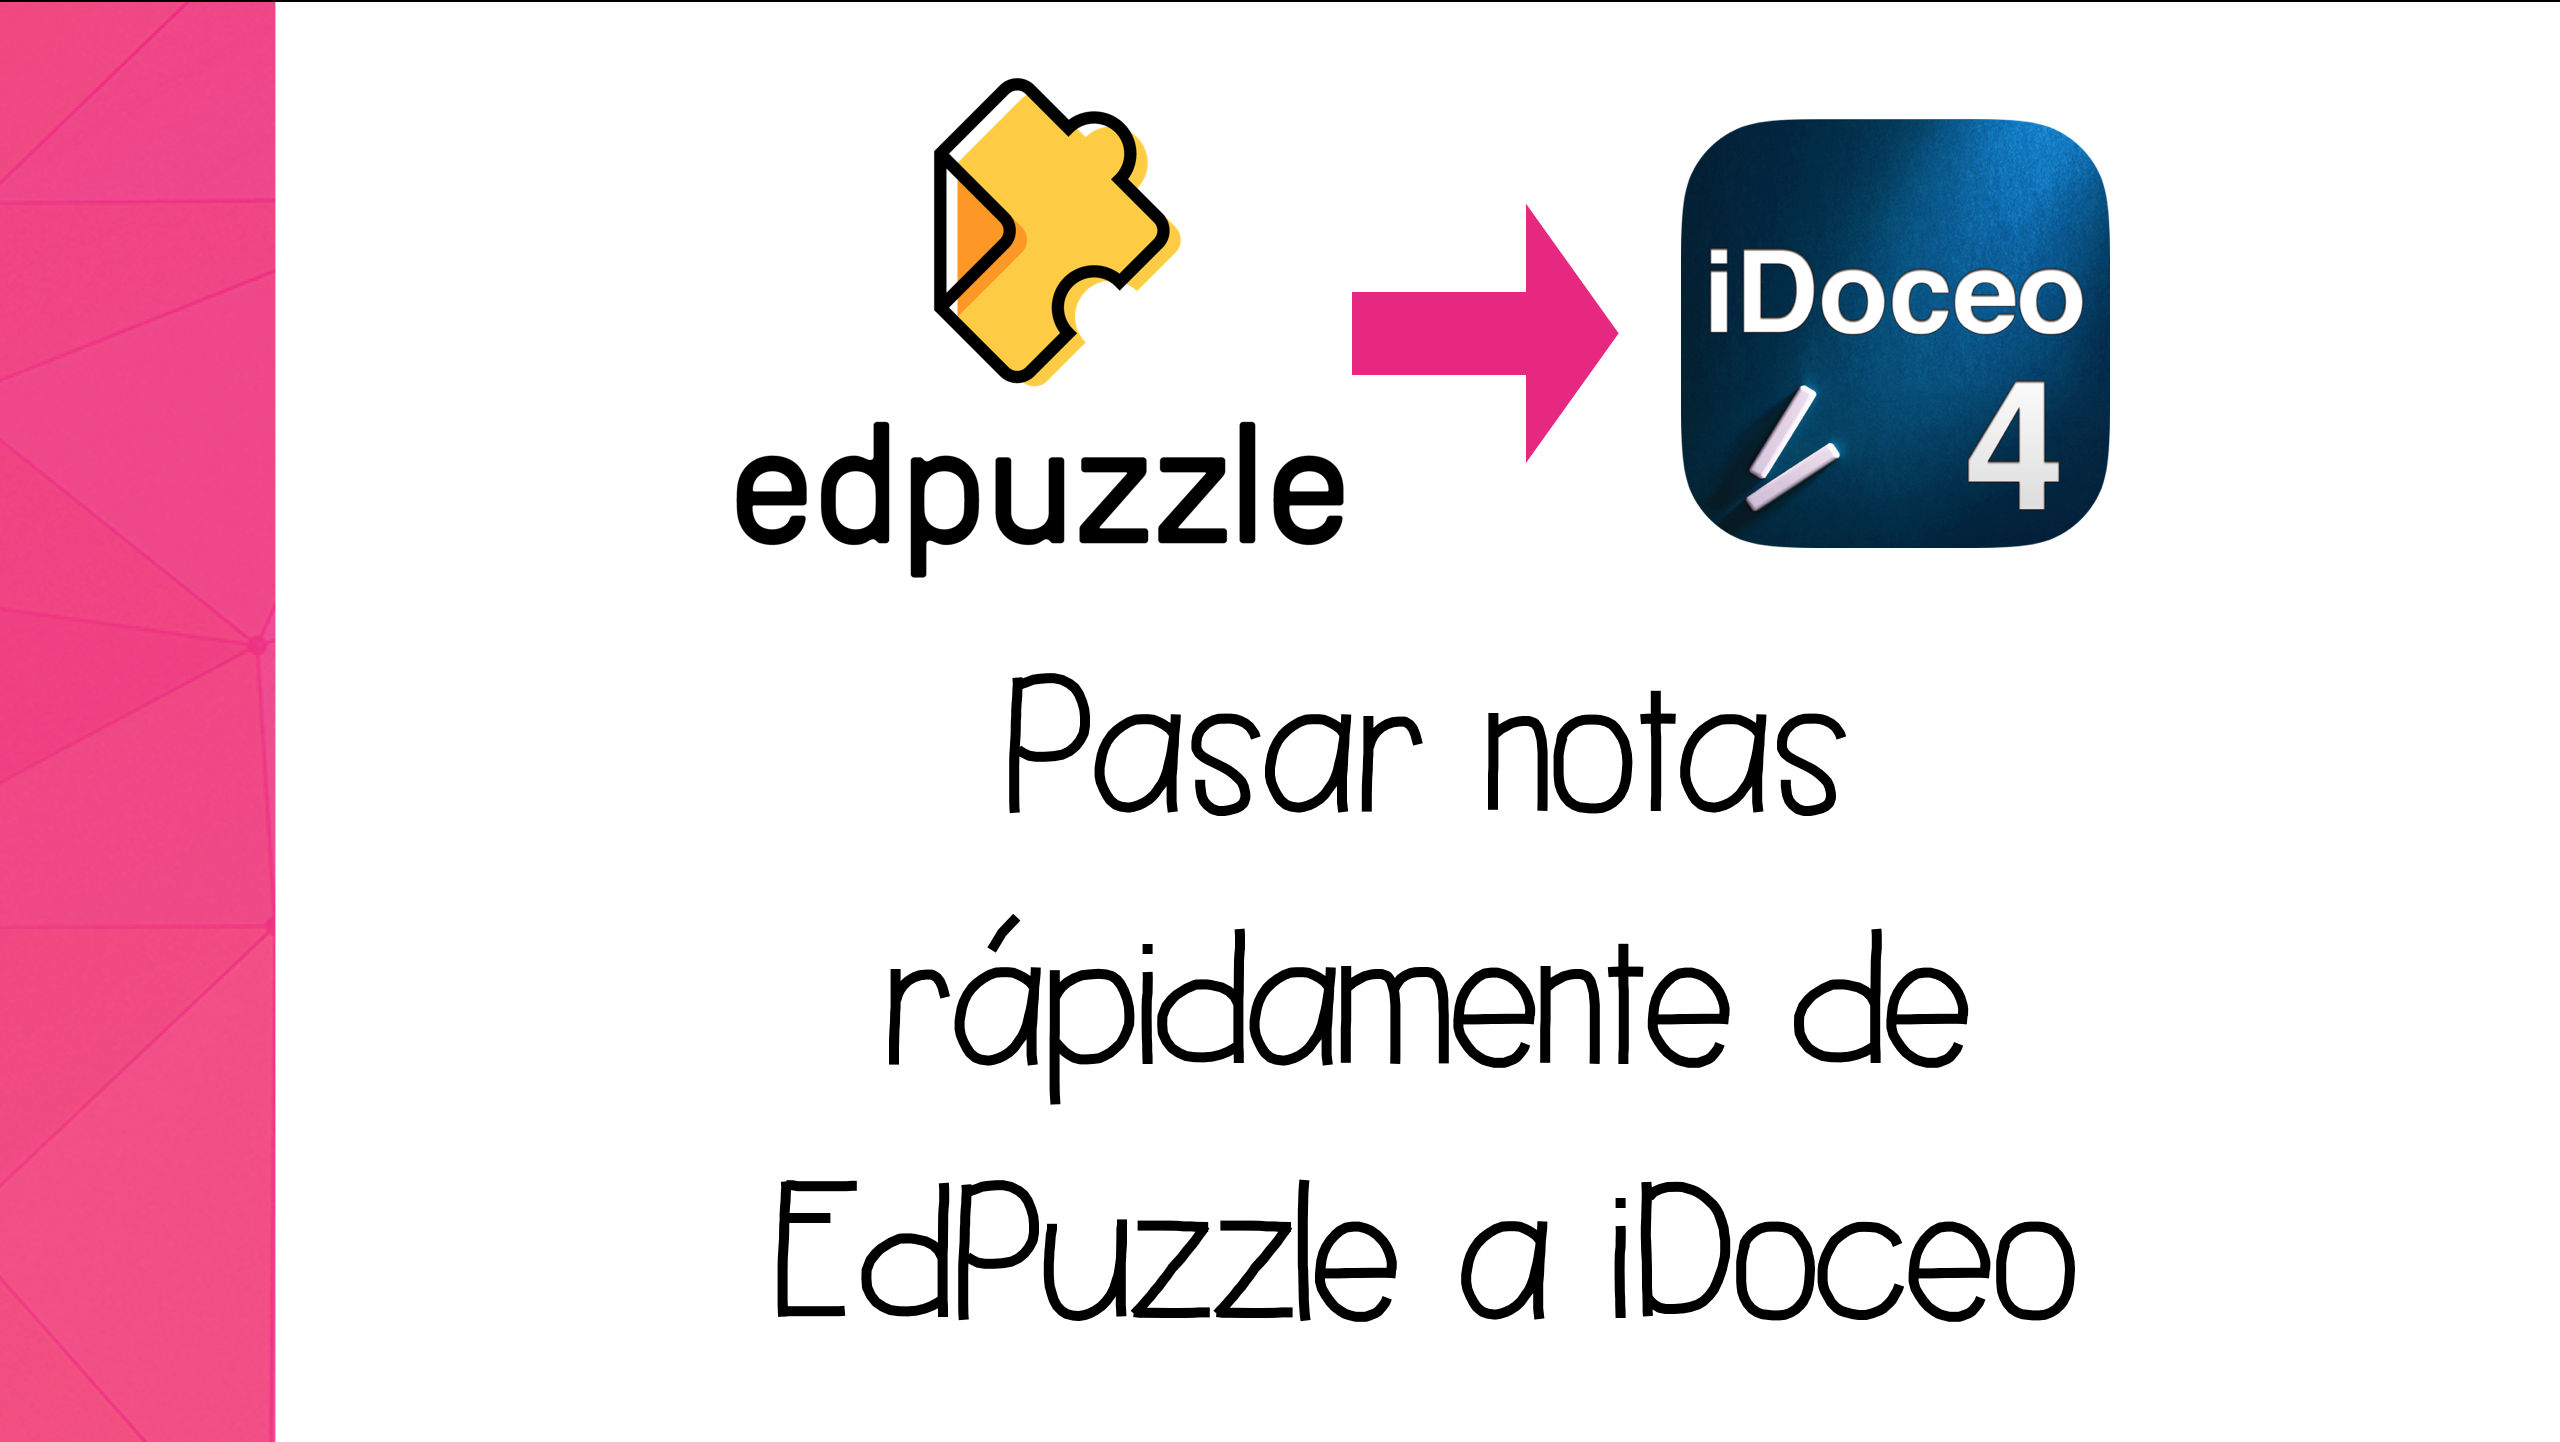 Cómo pasar notas de EdPuzzle a iDoceo con iOS 11